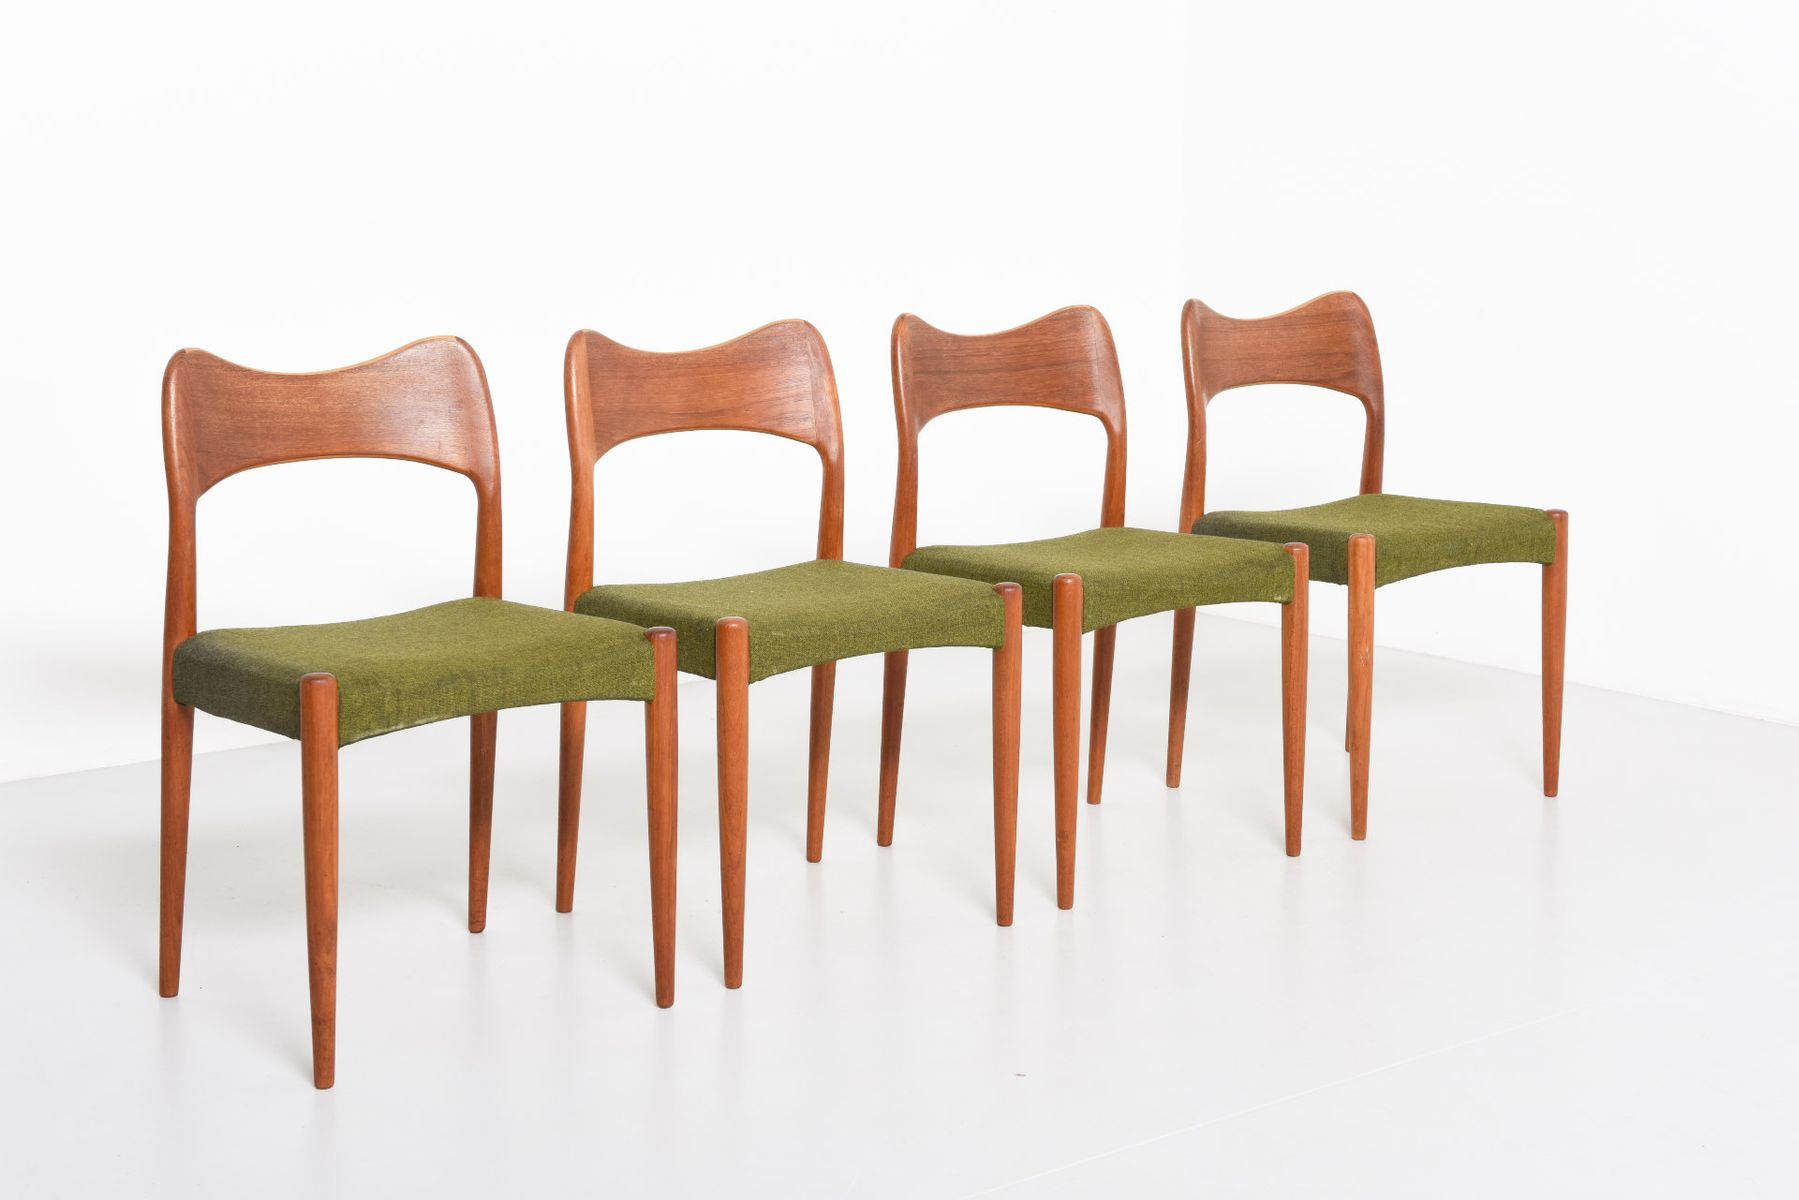 Teak Dining Chairs By Arne Hovmand Olsen For Mogens Kold Set Of 4 Sale At Pamono